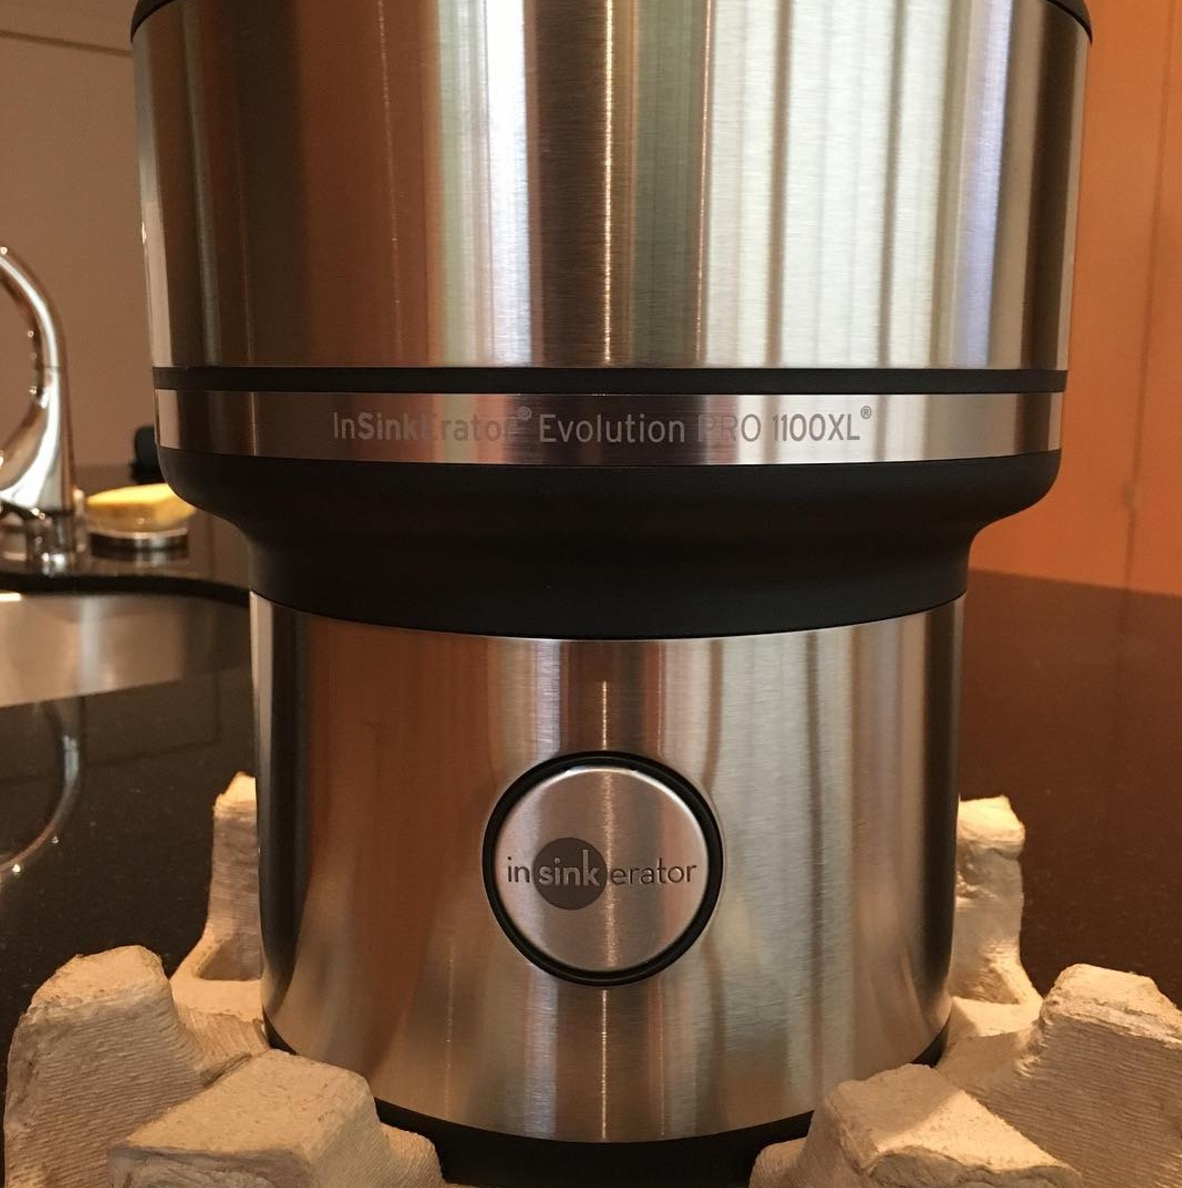 Insinkerator Pro 1100xl Evolution Series Garbage Disposal Wiring Kitchen Safety Home Maintenance The